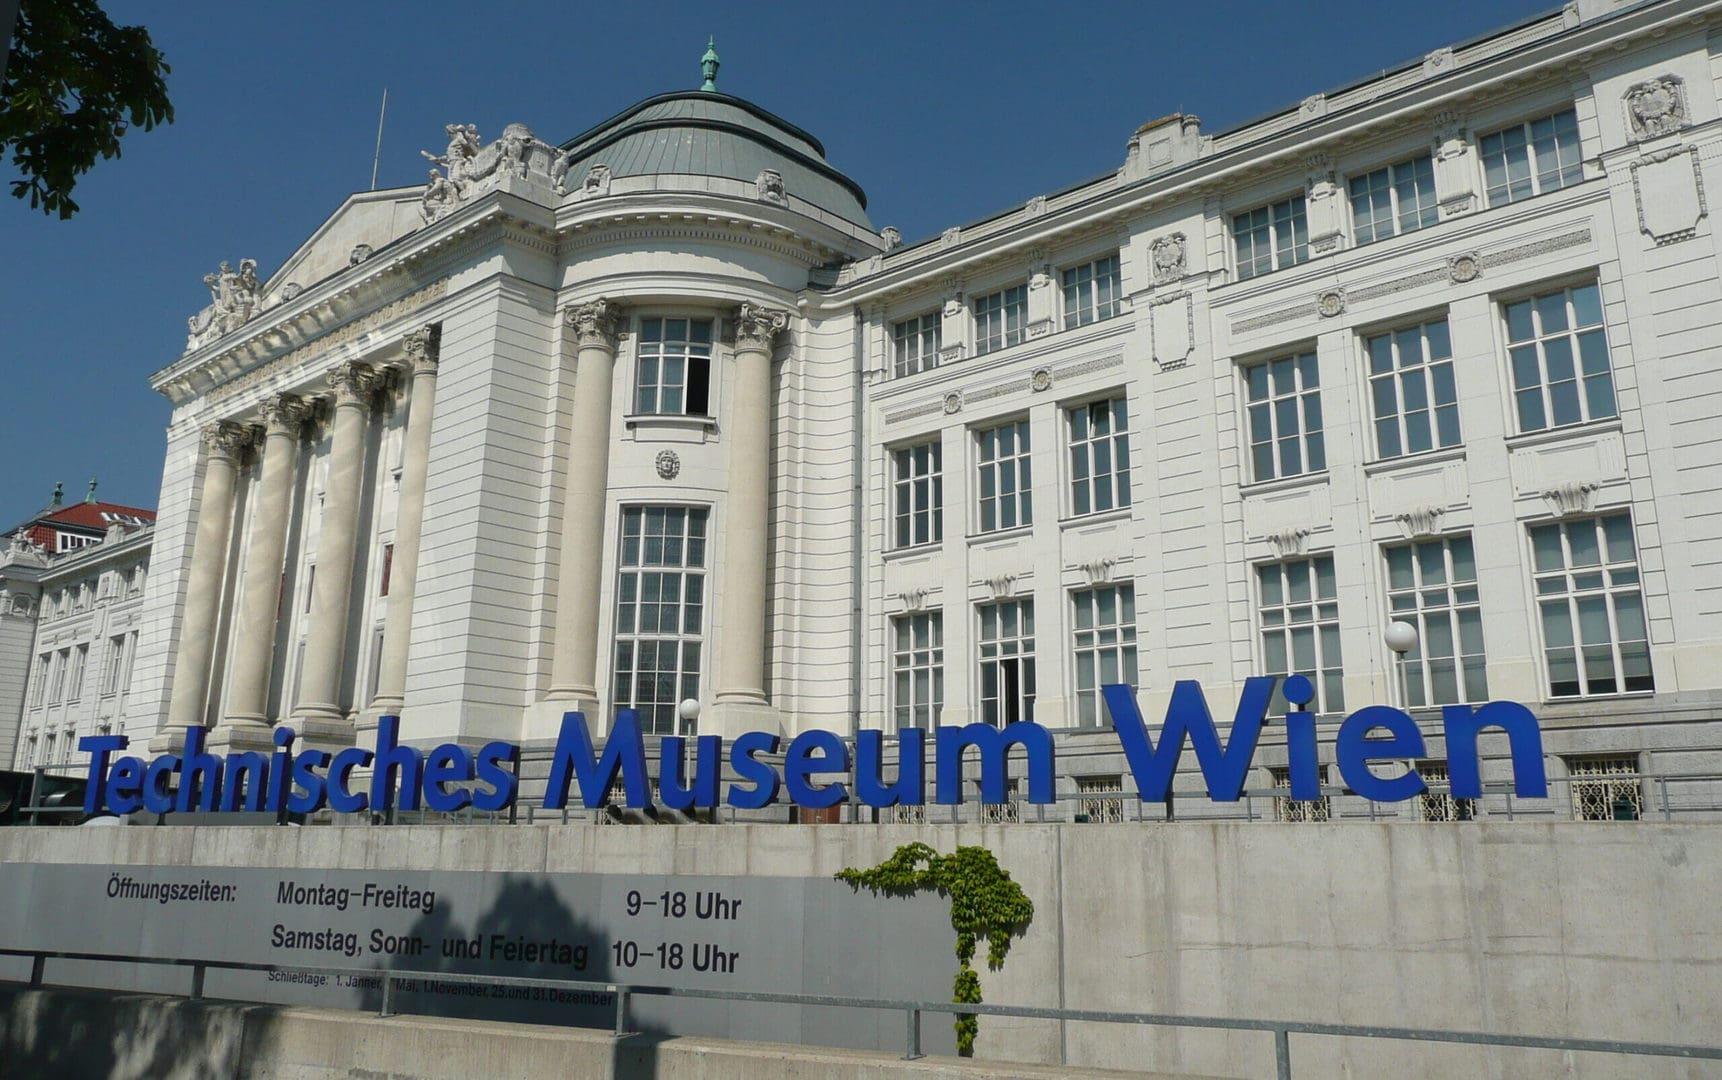 Studietur Wien Technisches Museum